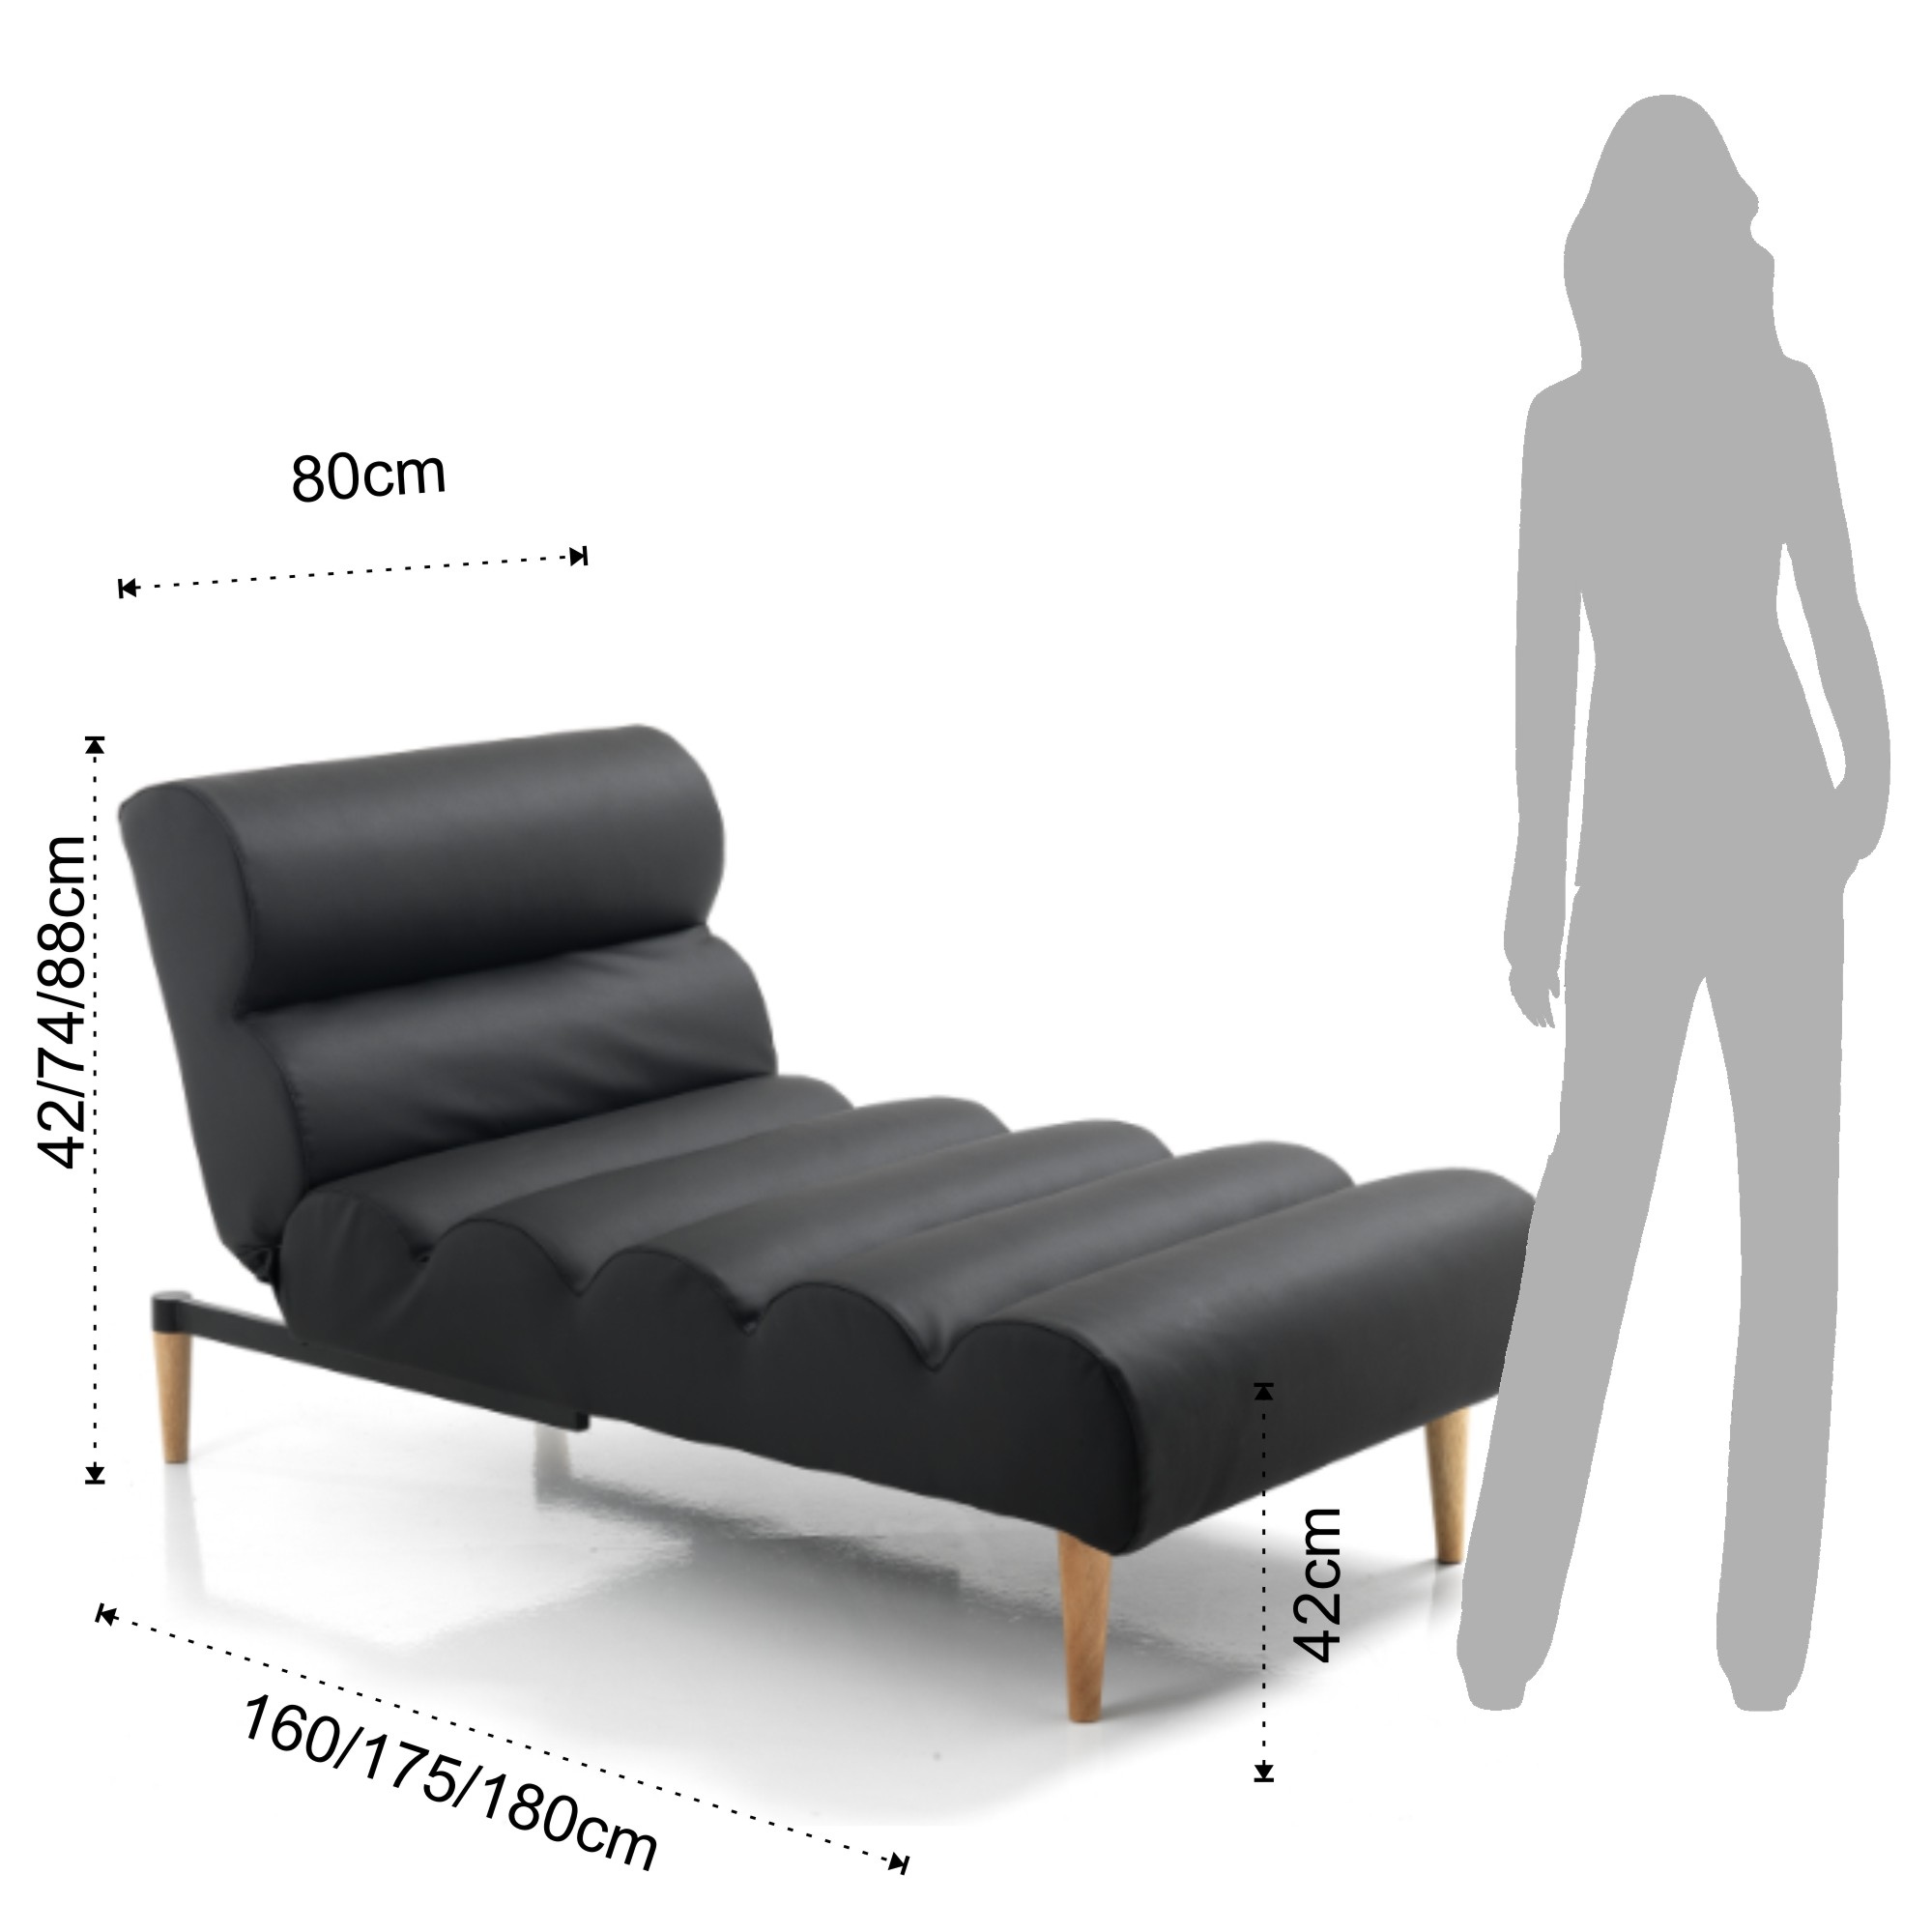 Blazers chaise longue bed gummy black for Dimension chaise longue